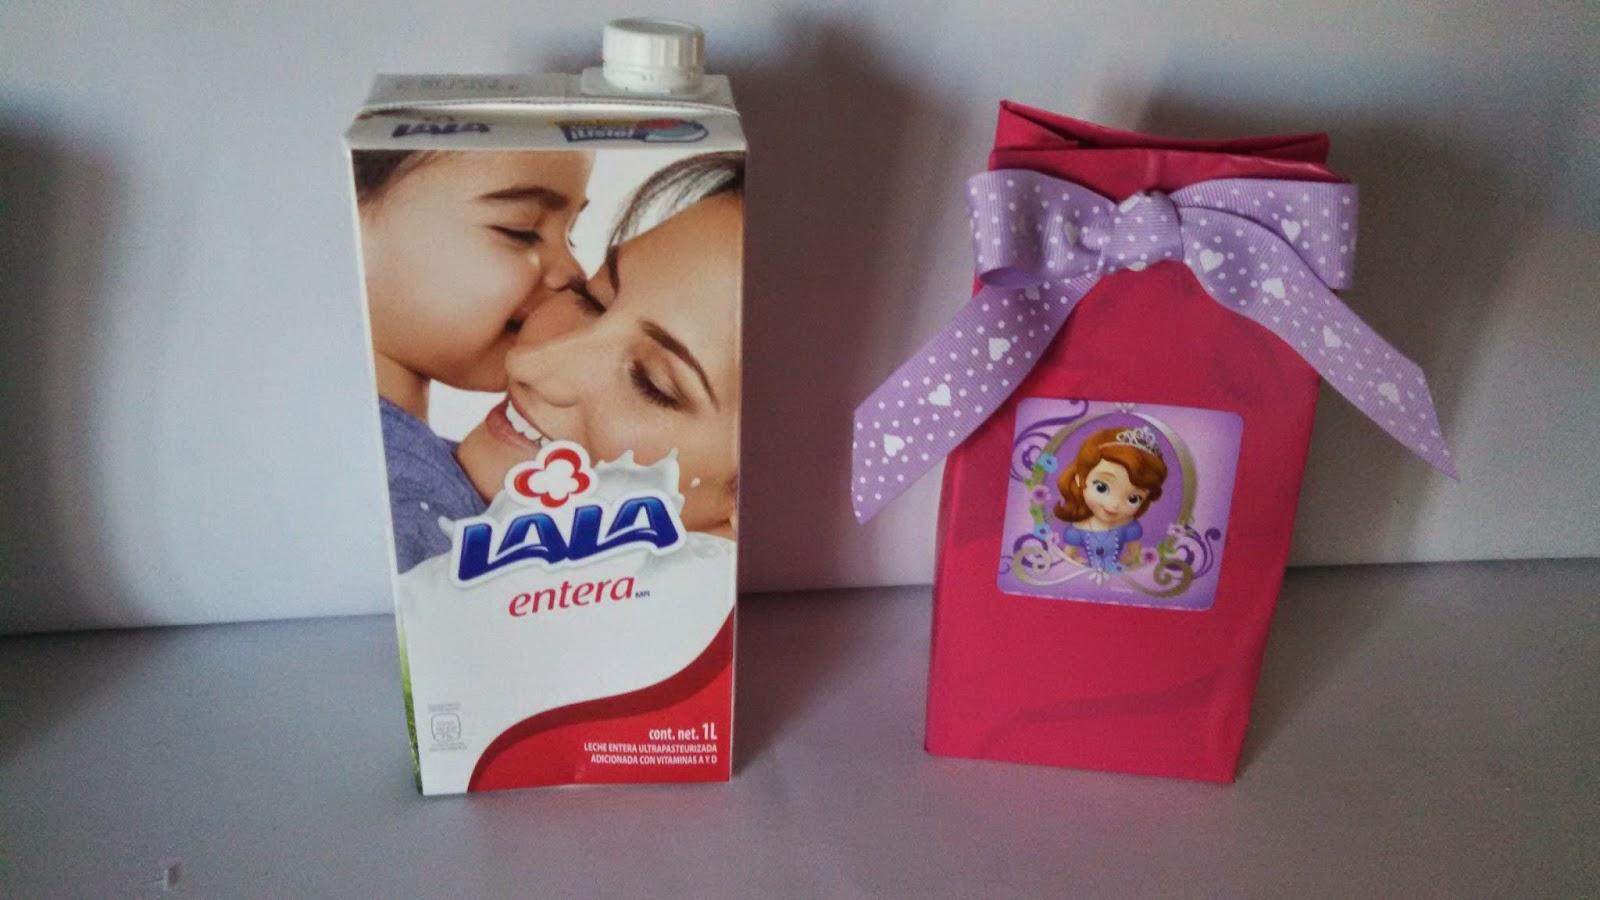 dulceros con cartones de leche